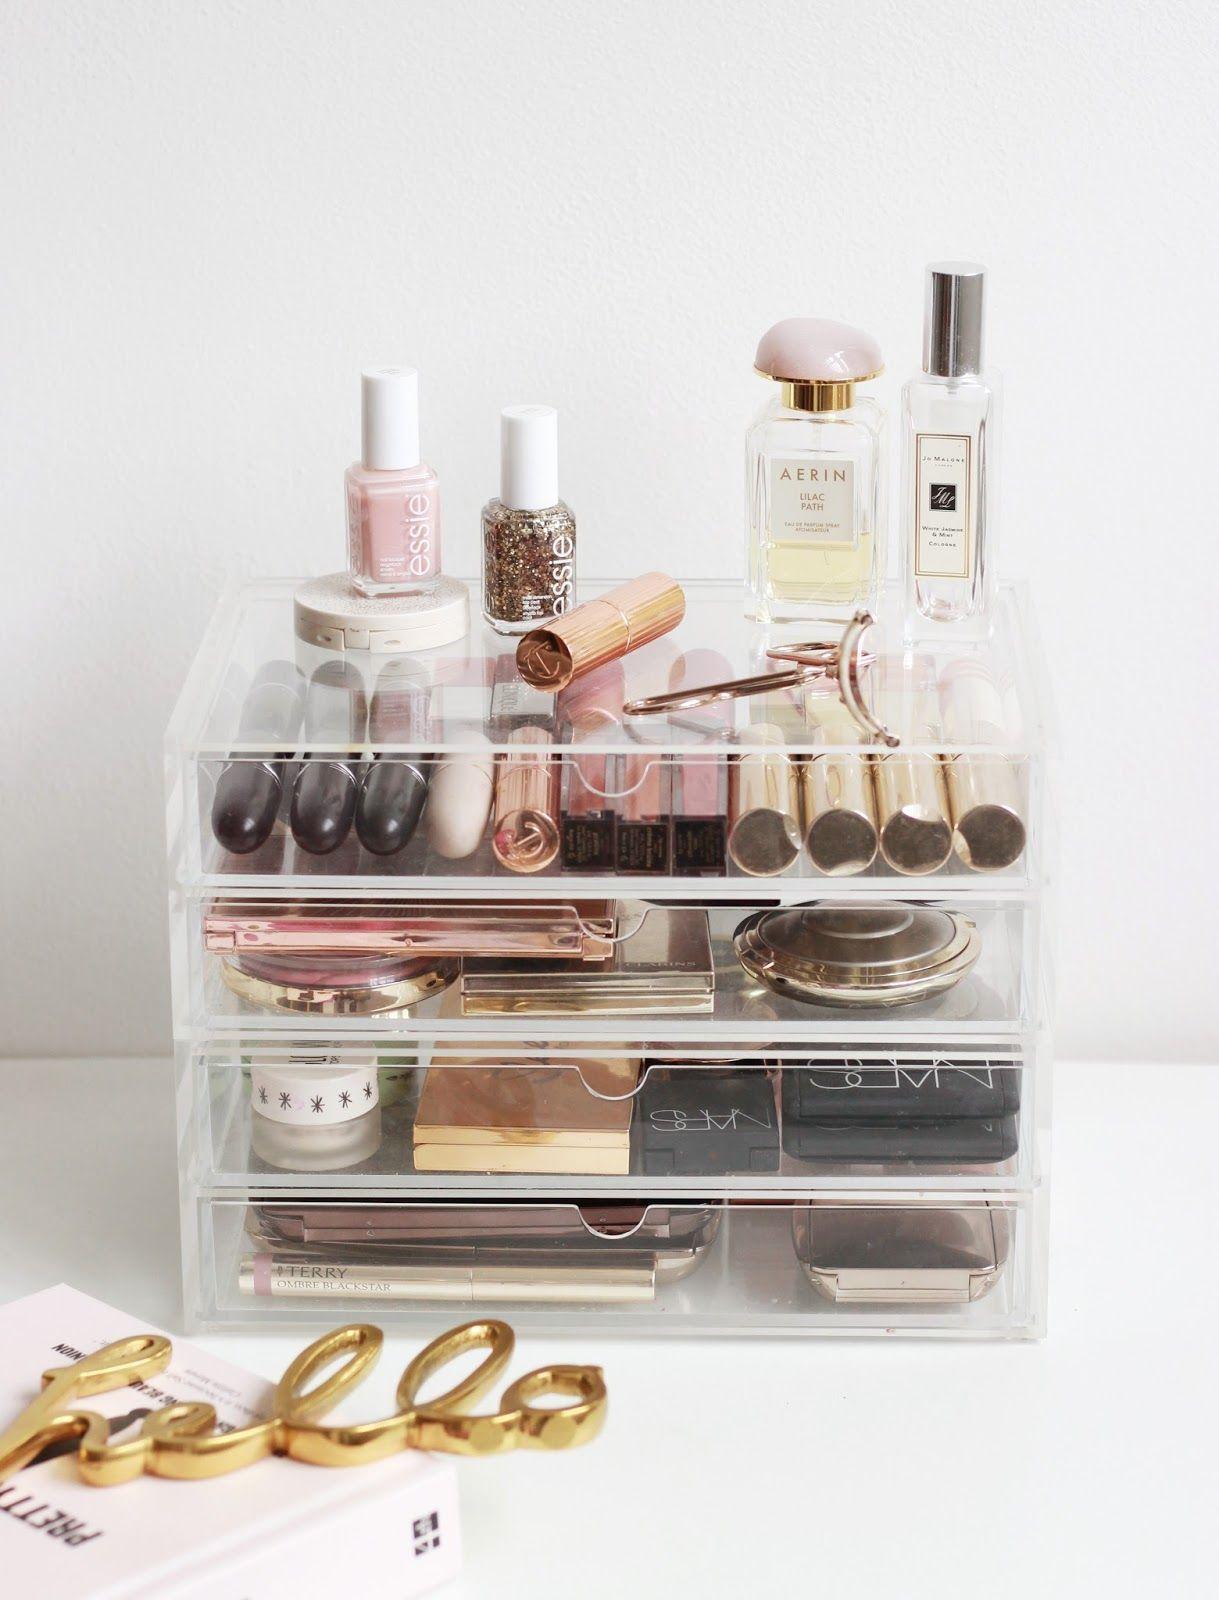 A Muji Makeup Storage Overhaul | Pint Sized Beauty & A Muji Makeup Storage Overhaul | Pinterest | Muji makeup storage ...